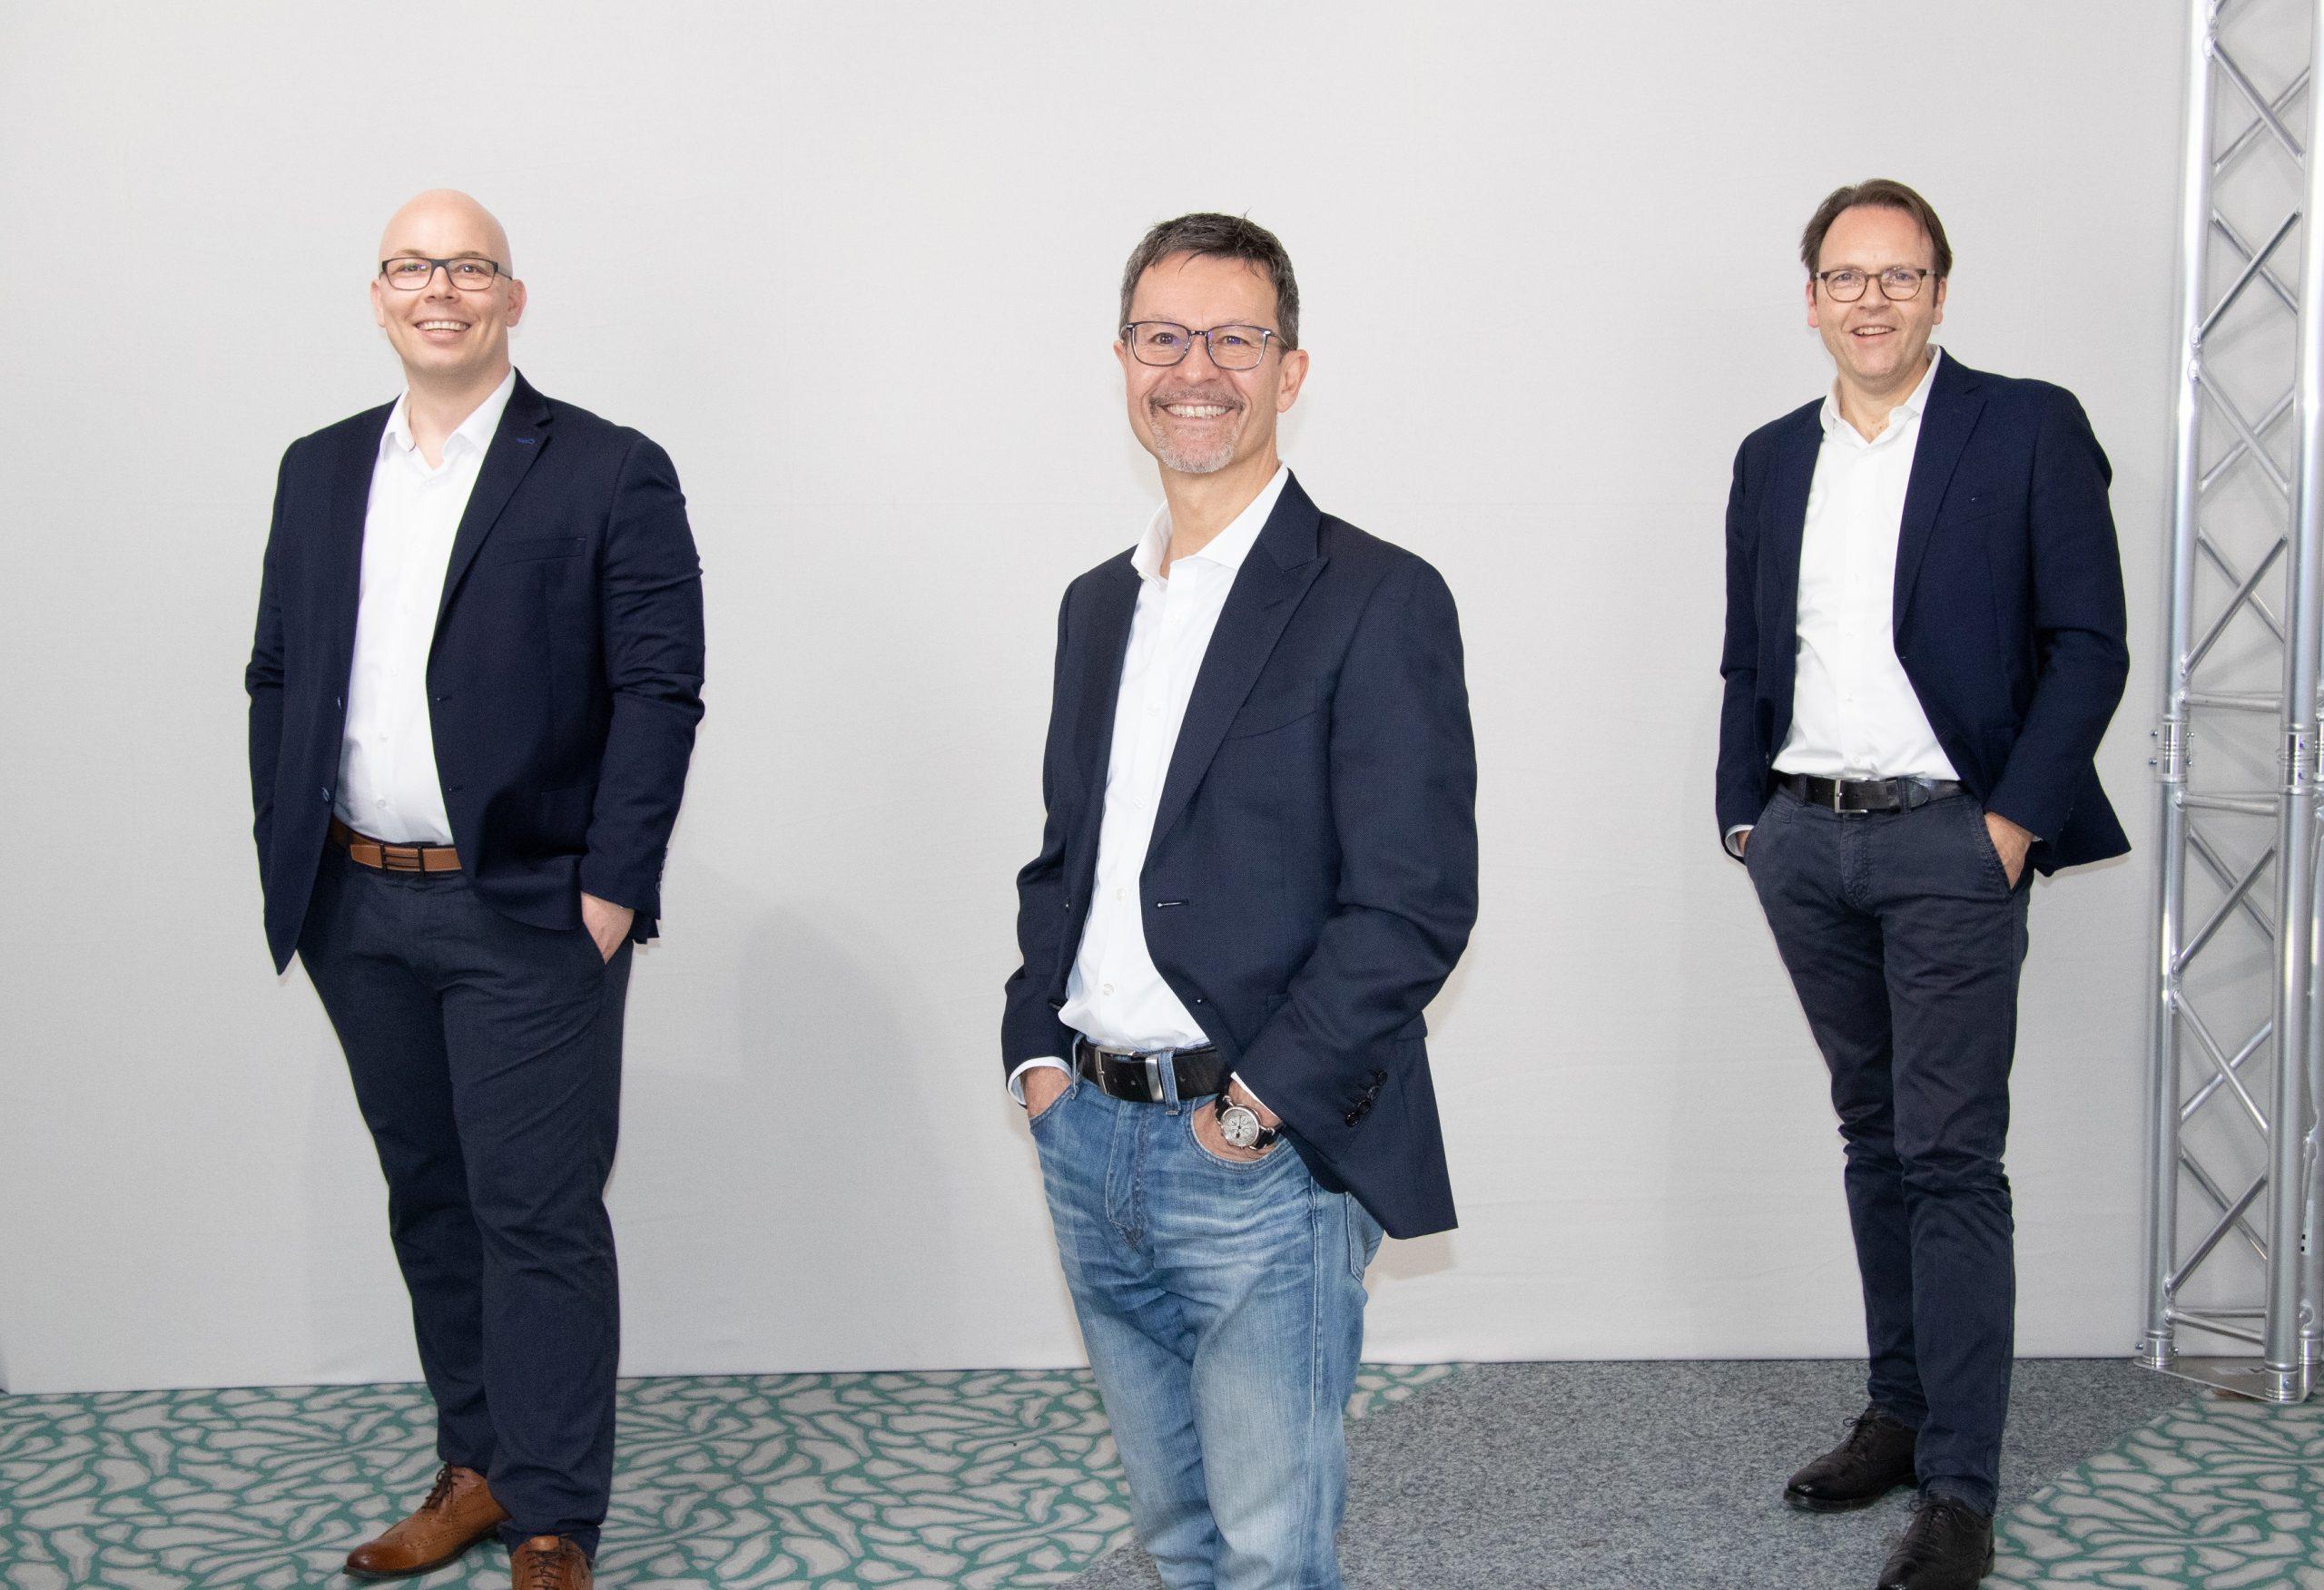 Bild: Deutscher Robotik Verband e.V.